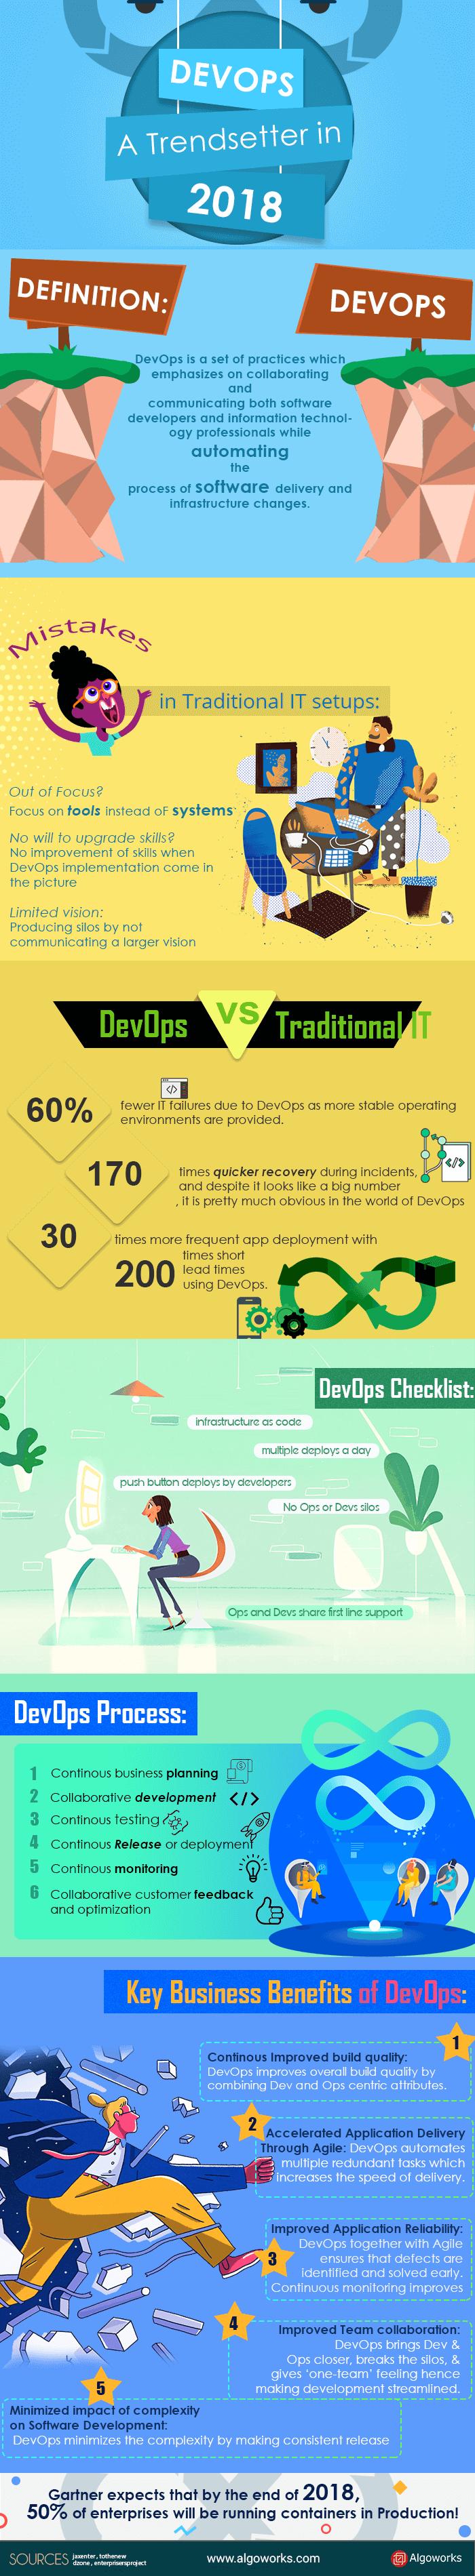 DevOps – A Trendsetter In 2018 | An Infographic